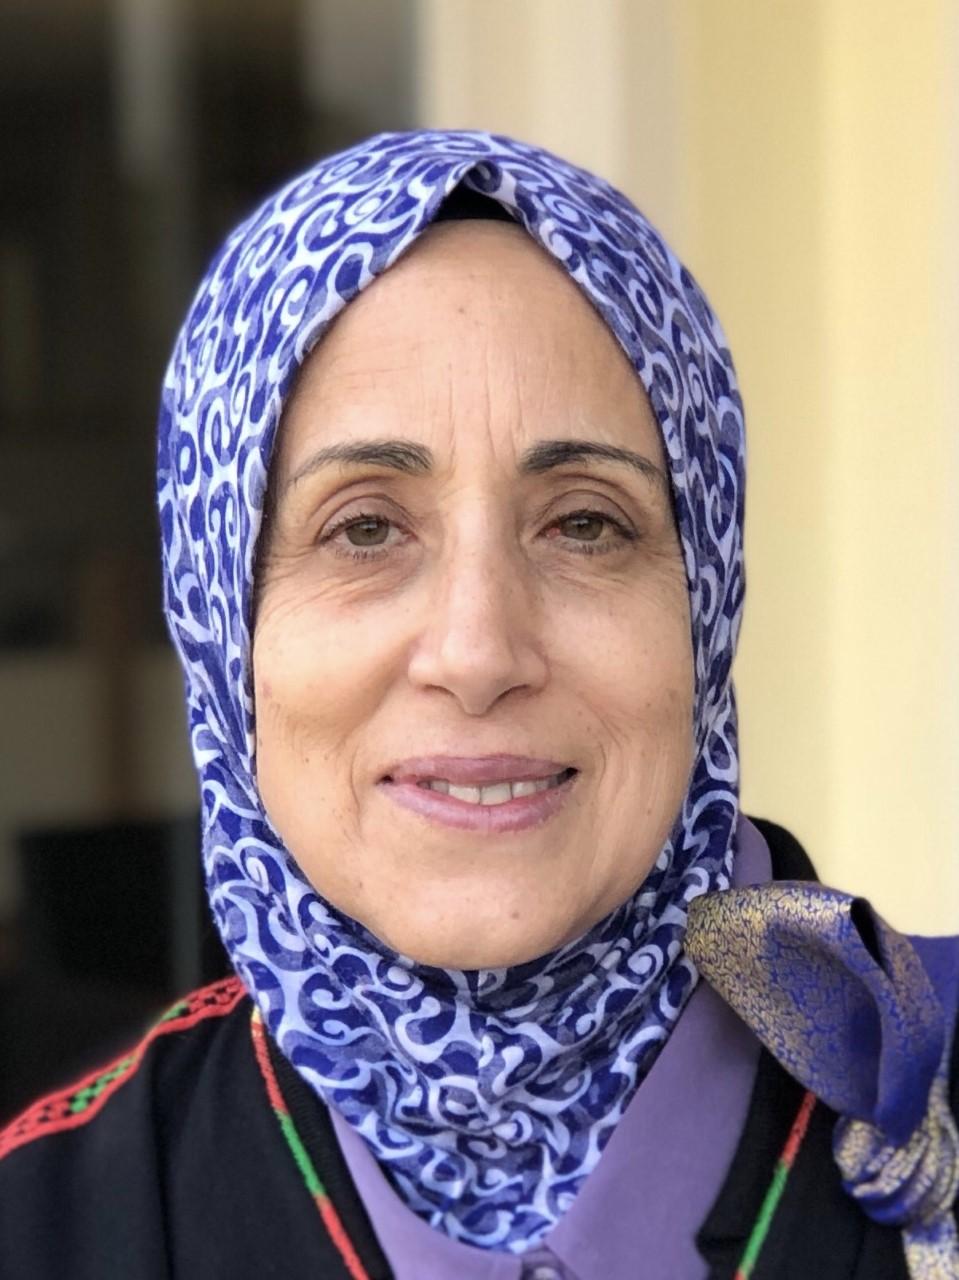 Omnia Marzouk